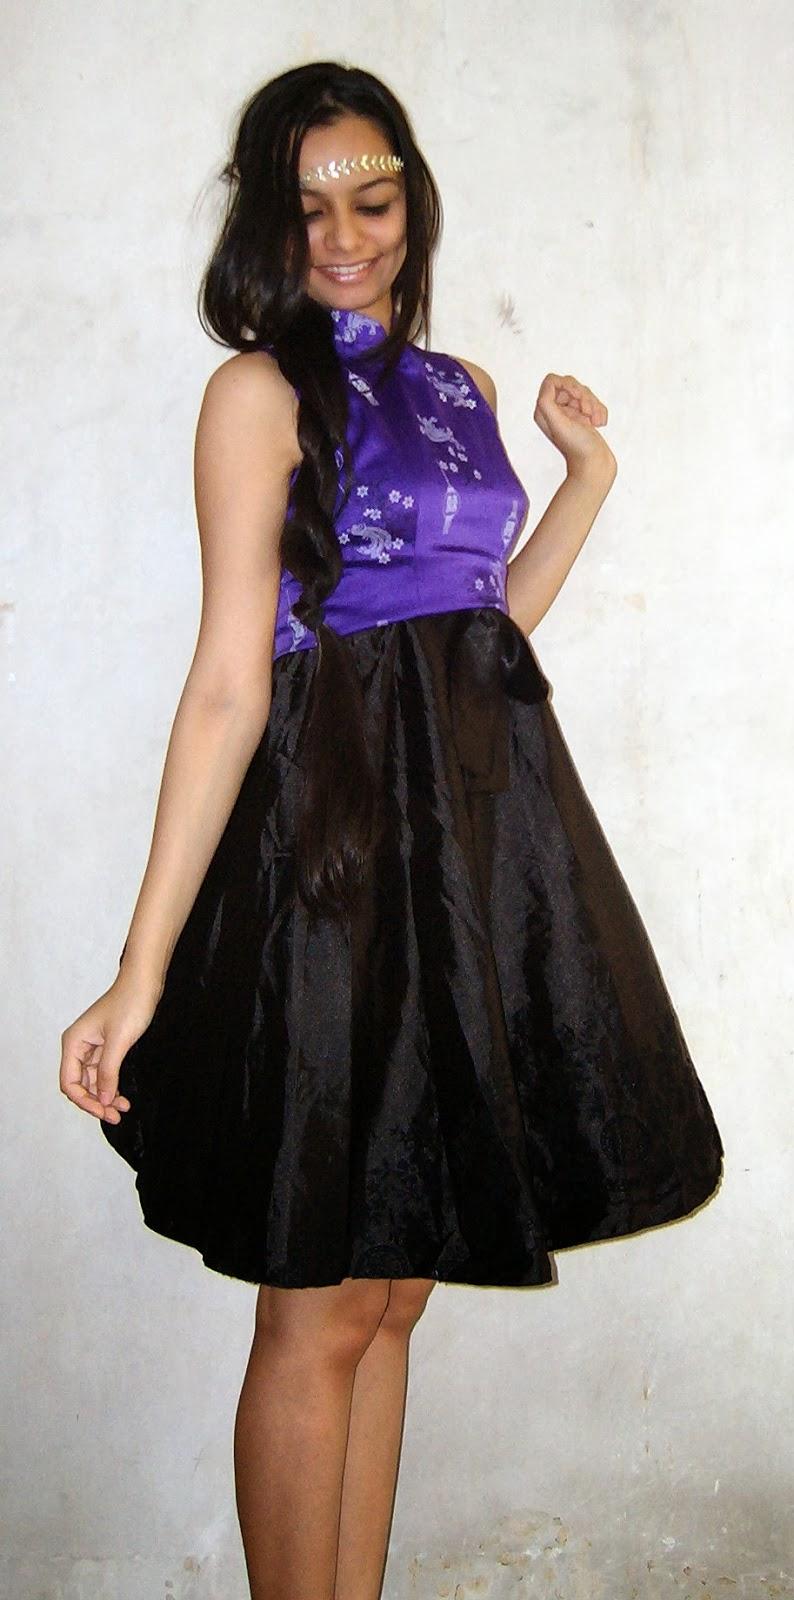 midi skirts, headband, black skirts, how to wear midi skirts, mumbai fashion blog, how to dress boho chic, party outfit ideas